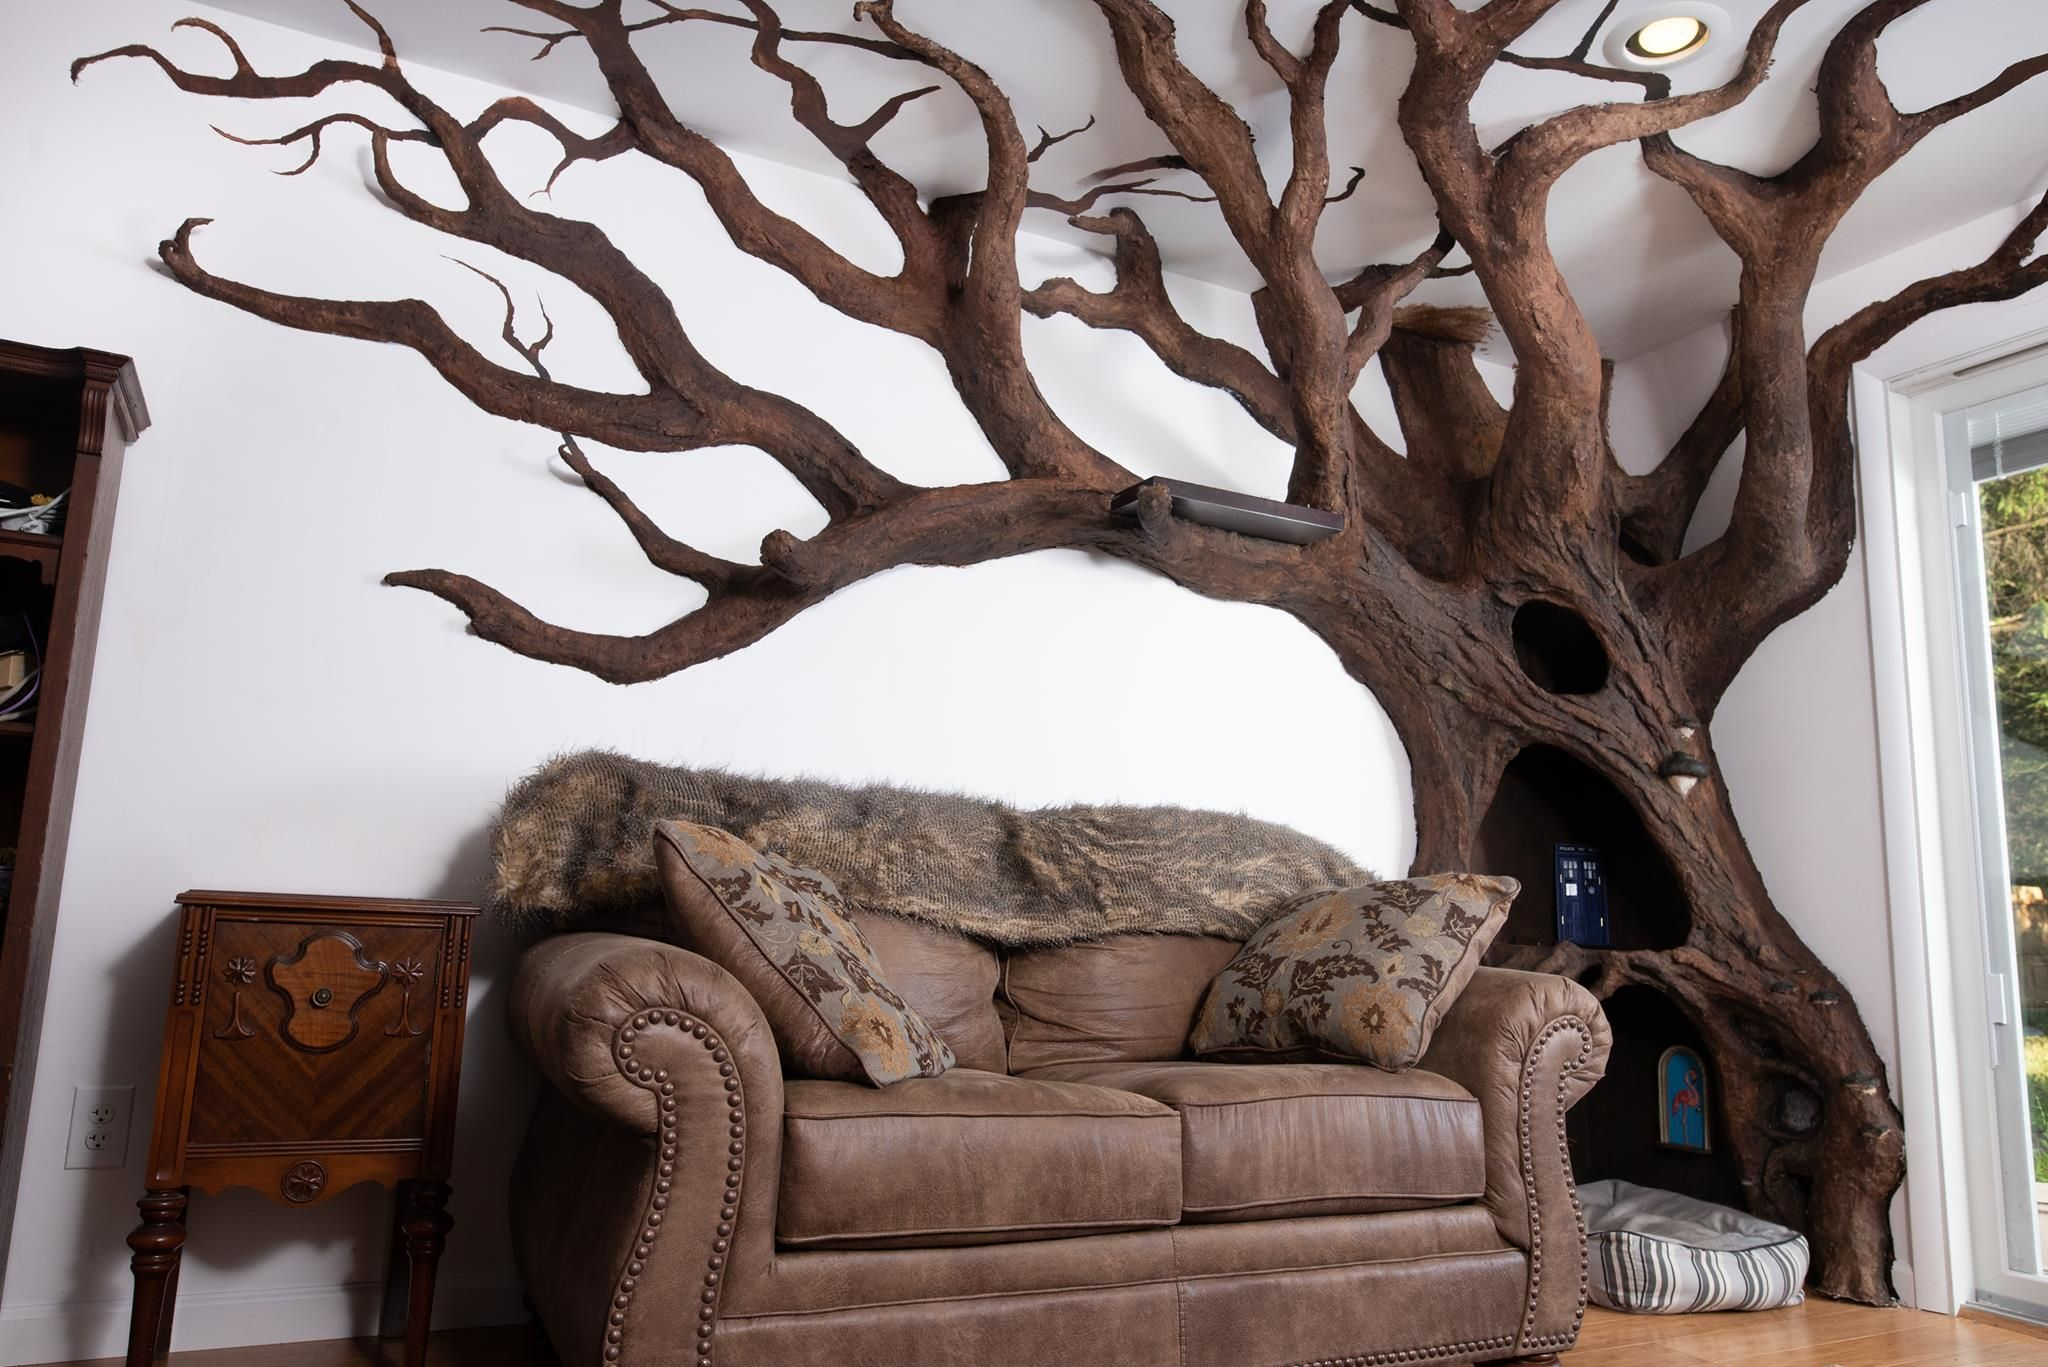 Pin By Irene C On Dream Home Ideas Custom Cat Trees Tree Sculpture Cat Tree